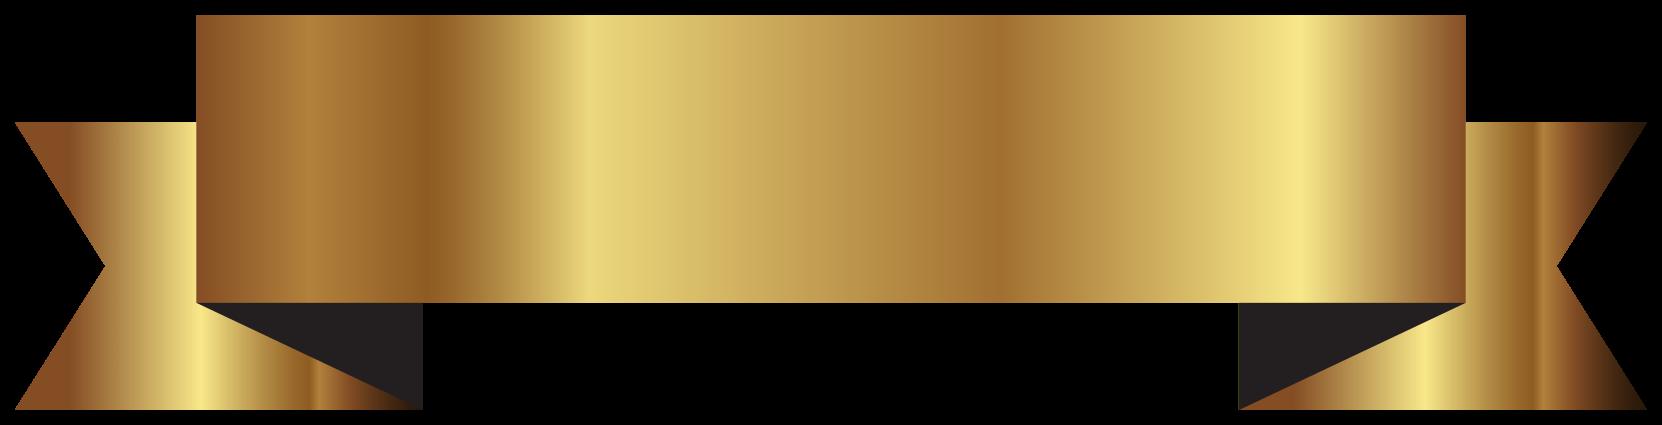 fita de ouro png